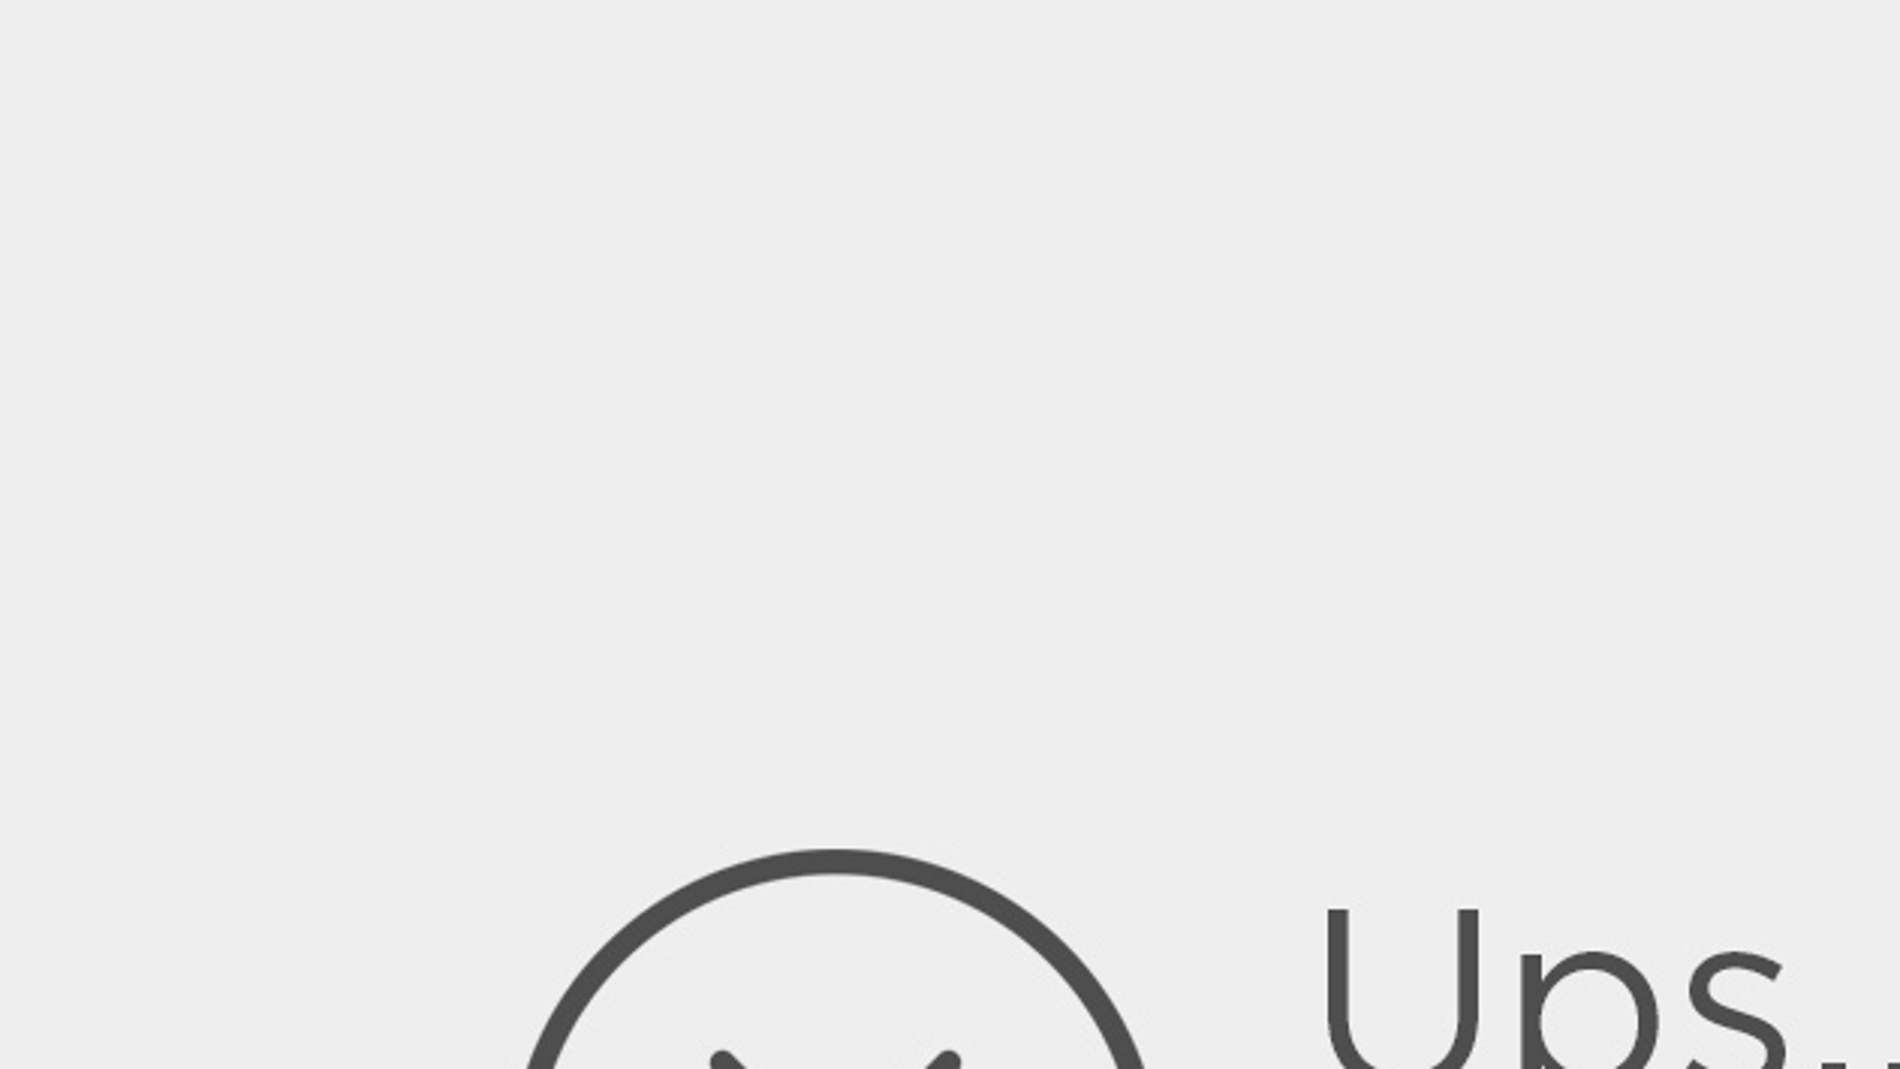 Rodaje de Bourne 5